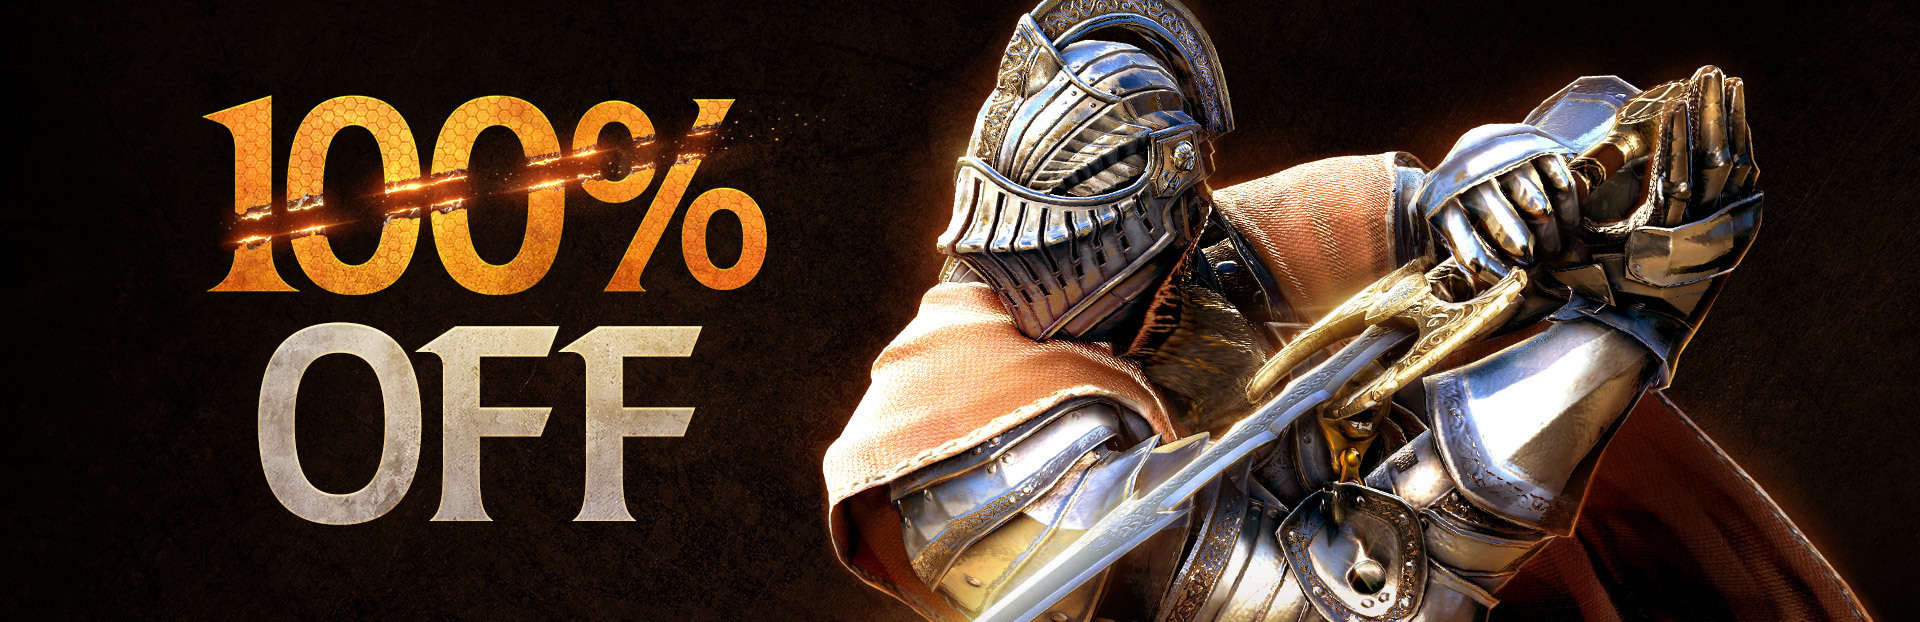 Black Desert Online Is Free On Steam Until March 10th 4